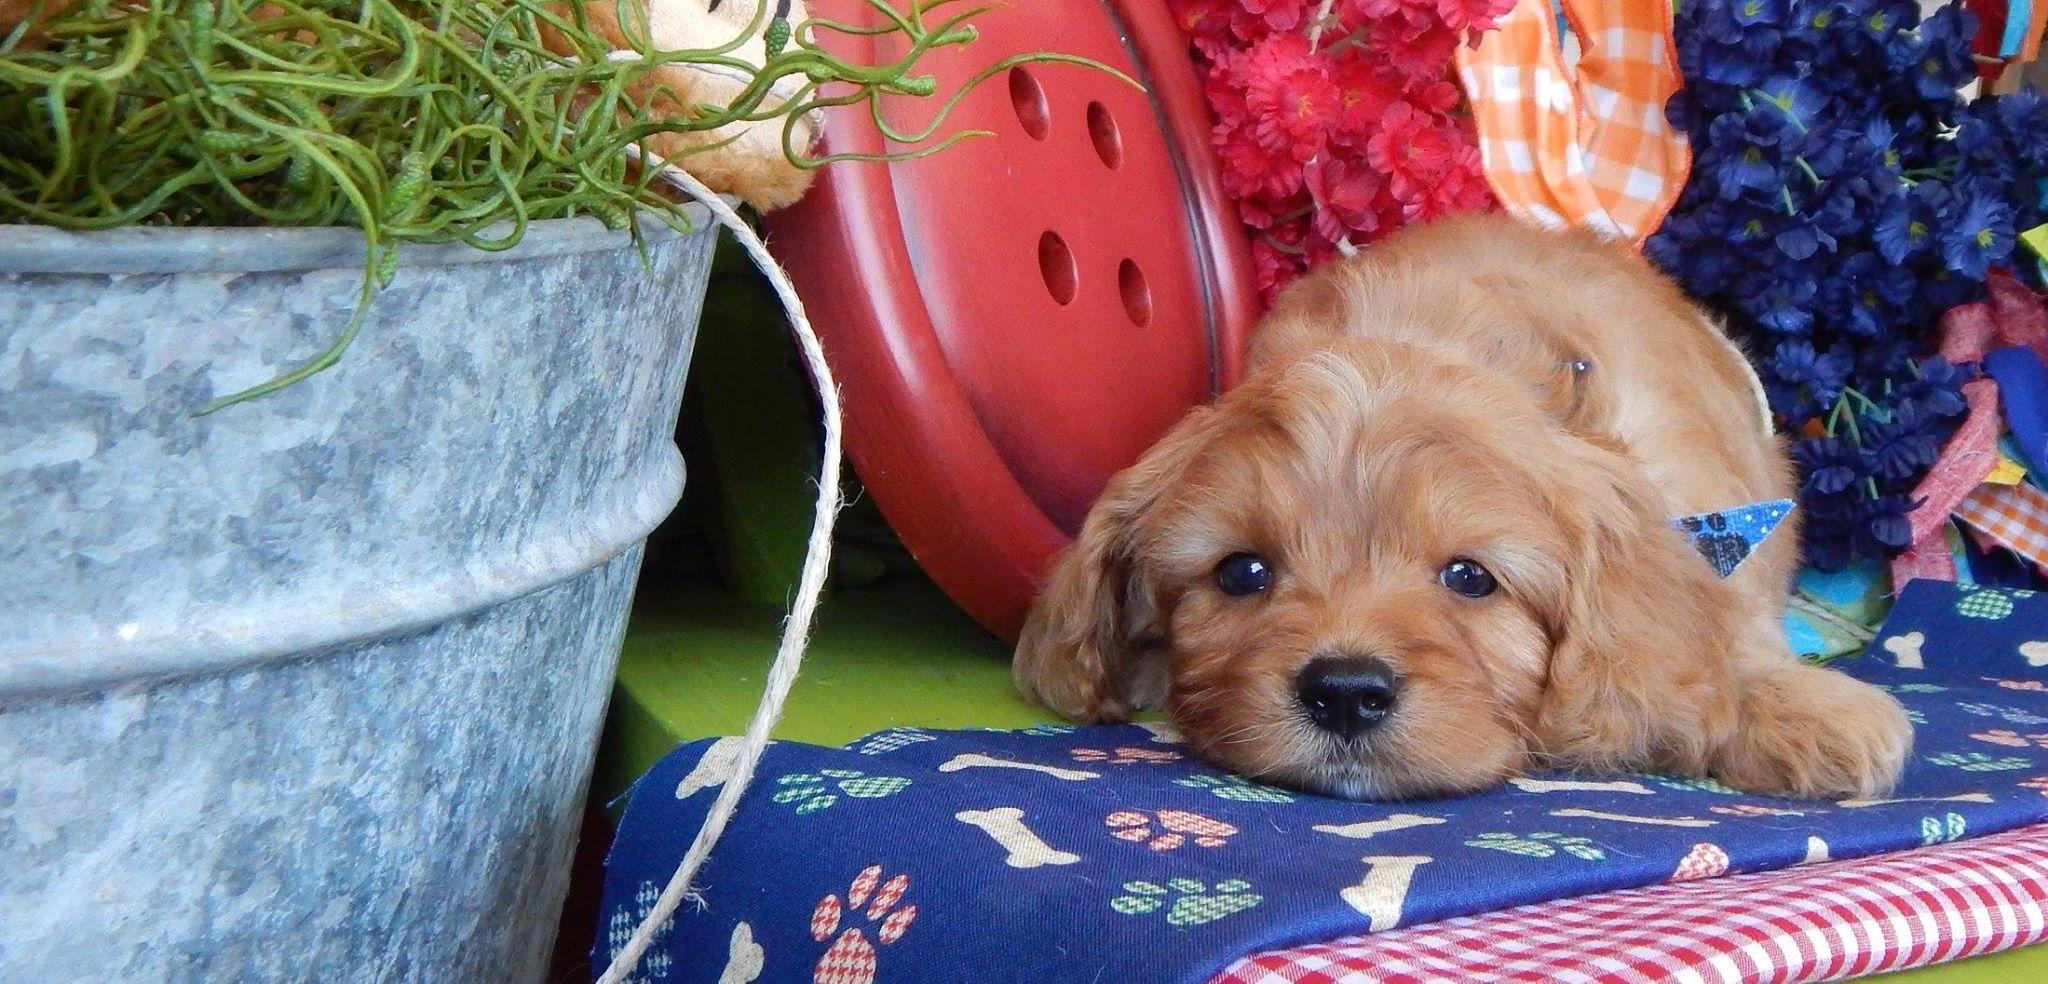 Cavapoo puppies for sale, Cavapoo, Cavapoos, Cavapoo dog